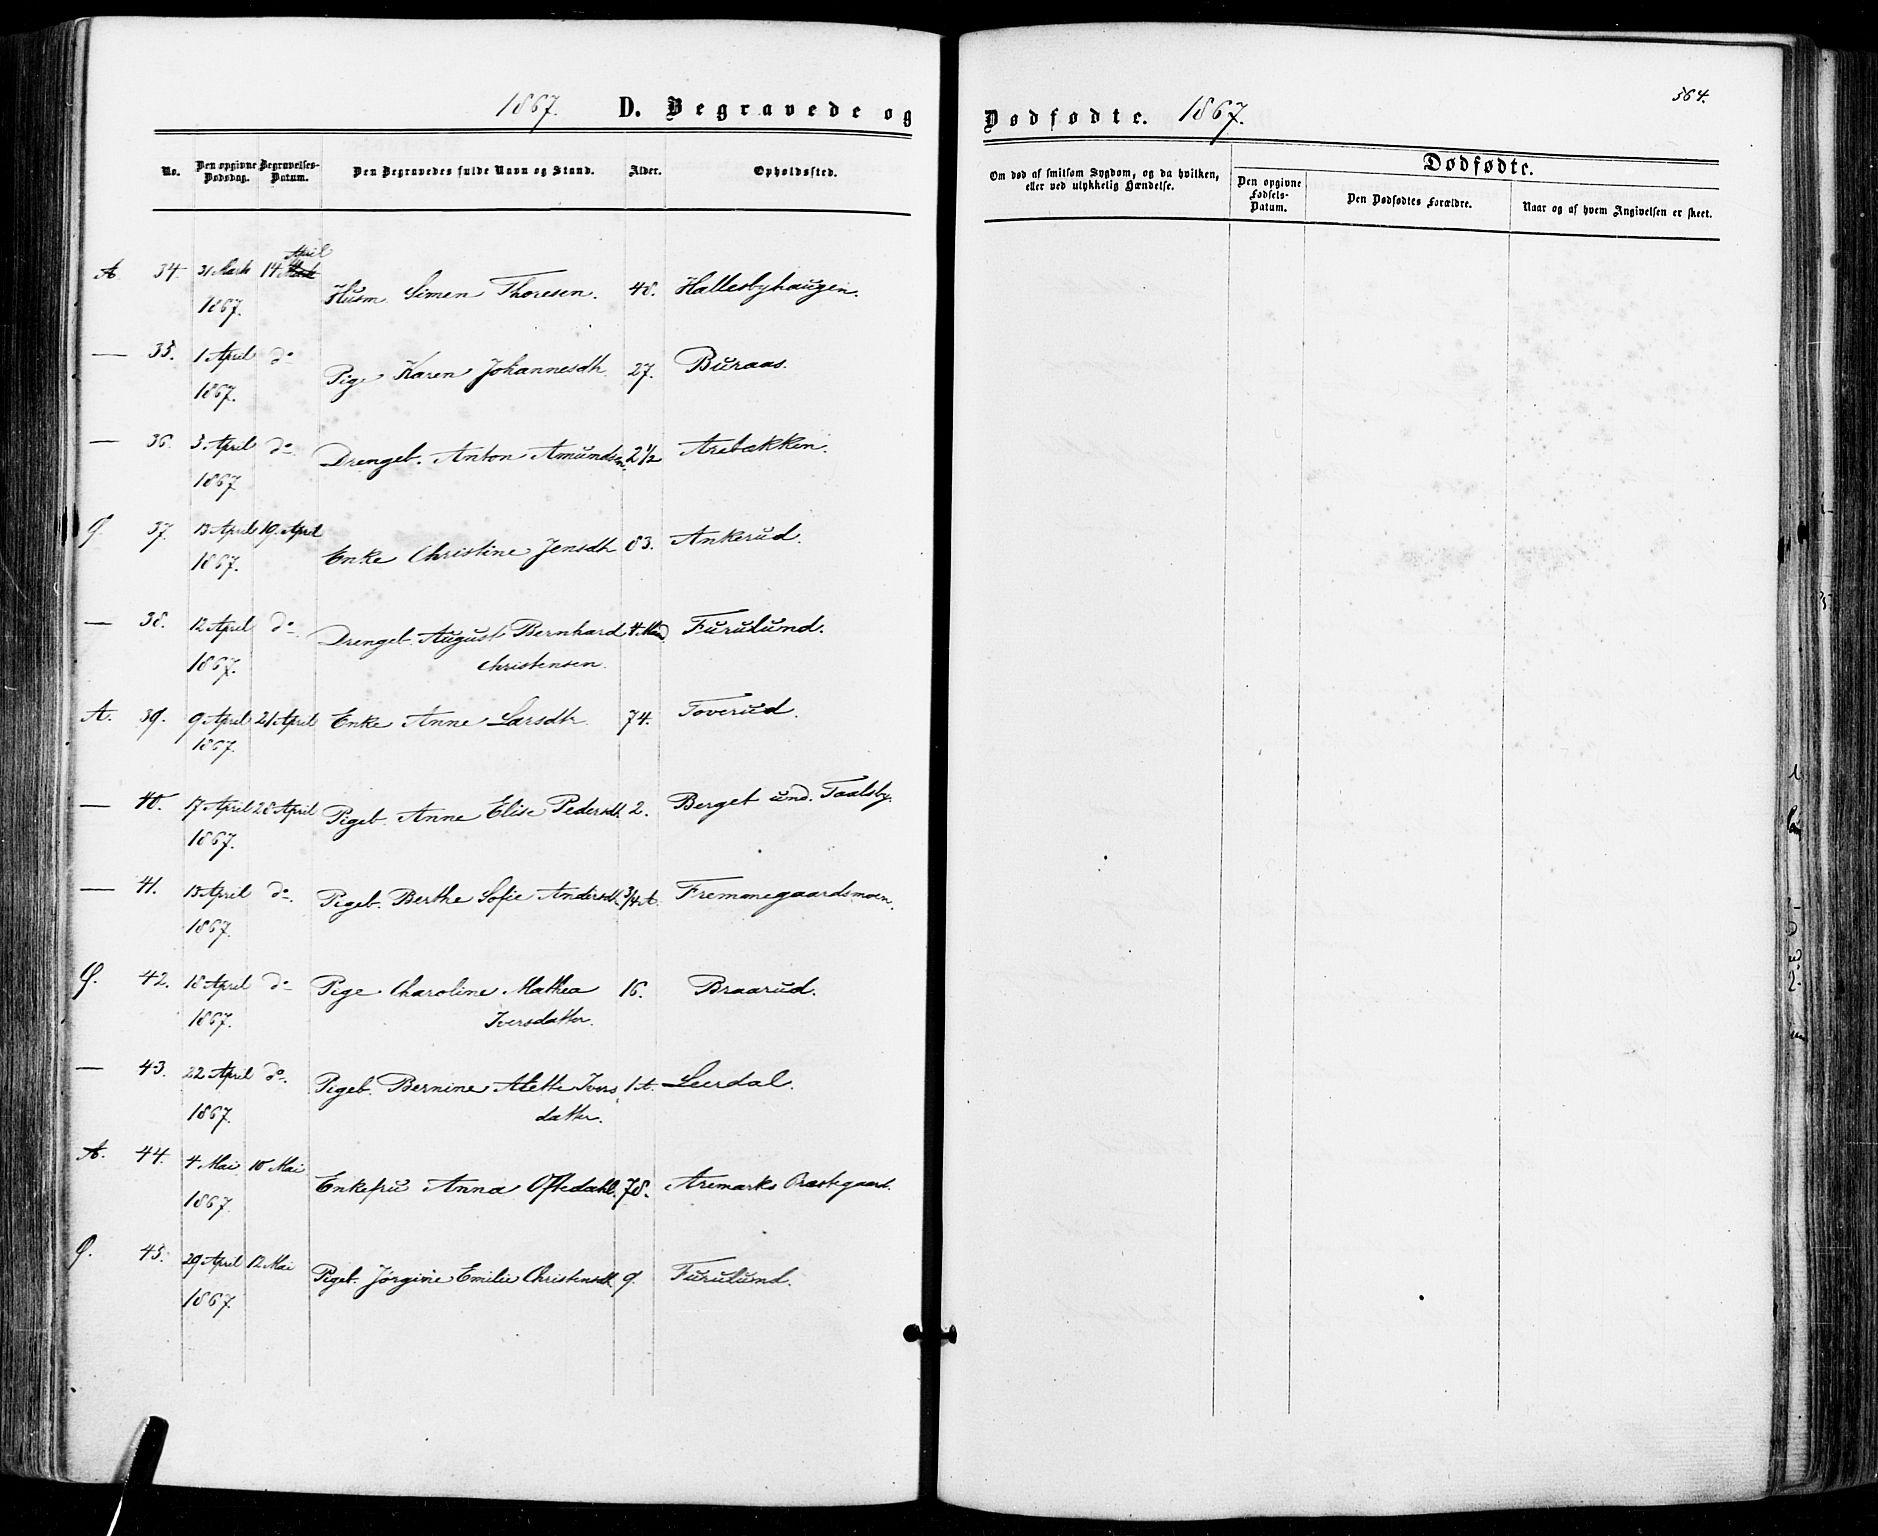 SAO, Aremark prestekontor Kirkebøker, F/Fc/L0004: Ministerialbok nr. III 4, 1866-1877, s. 563-564